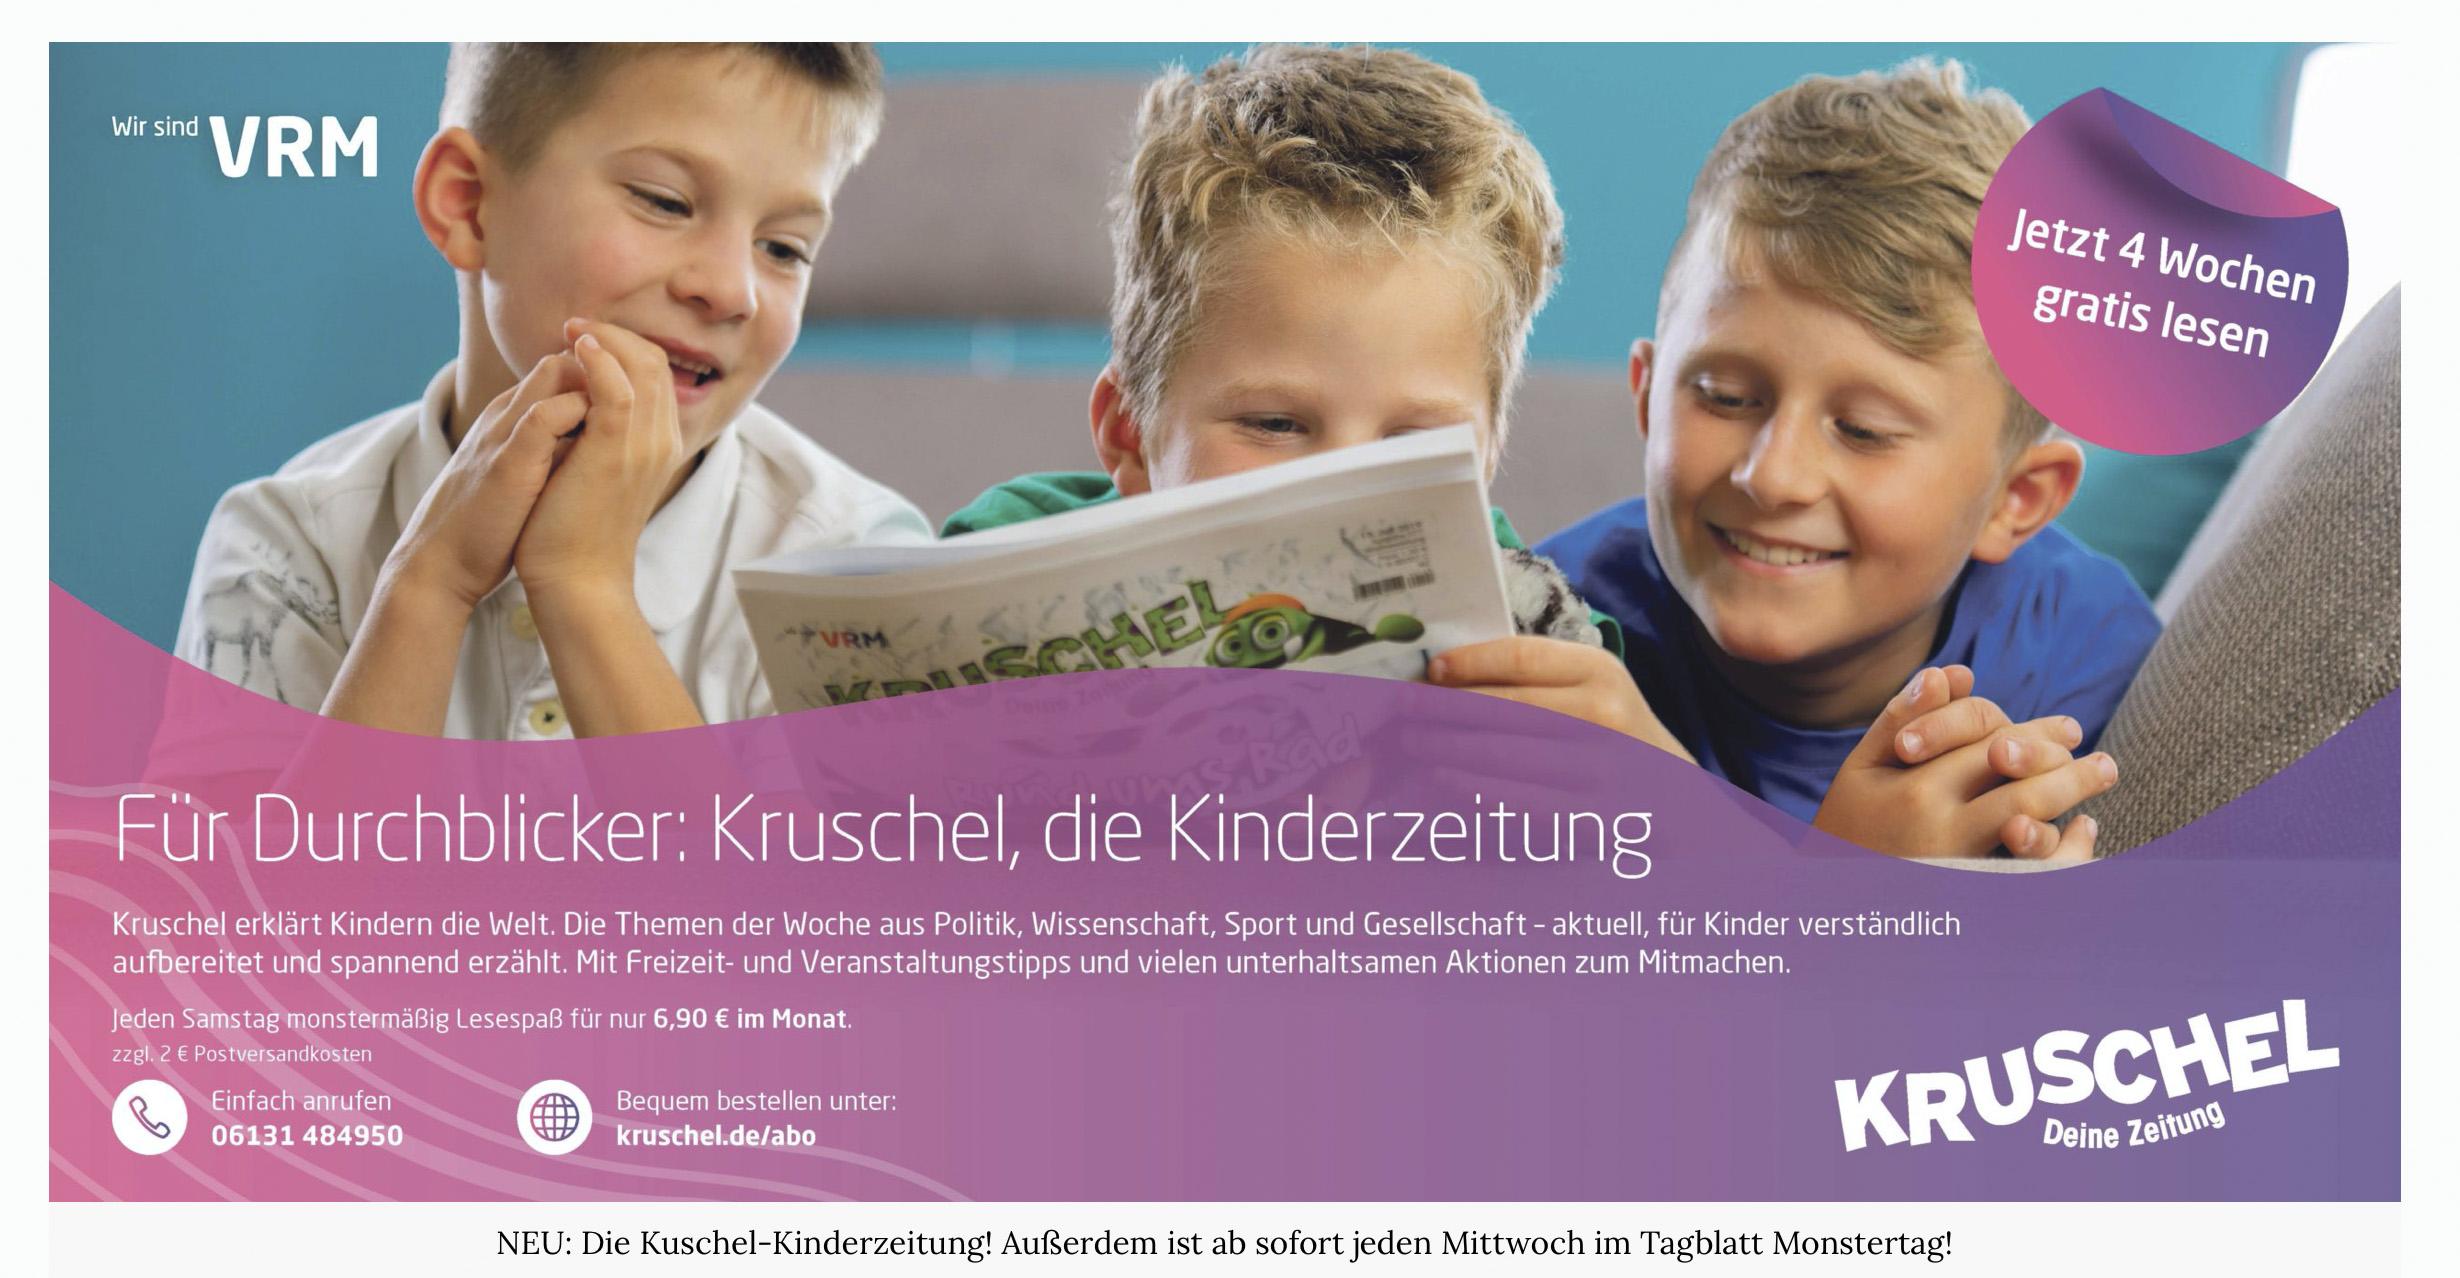 VRM Kuschel